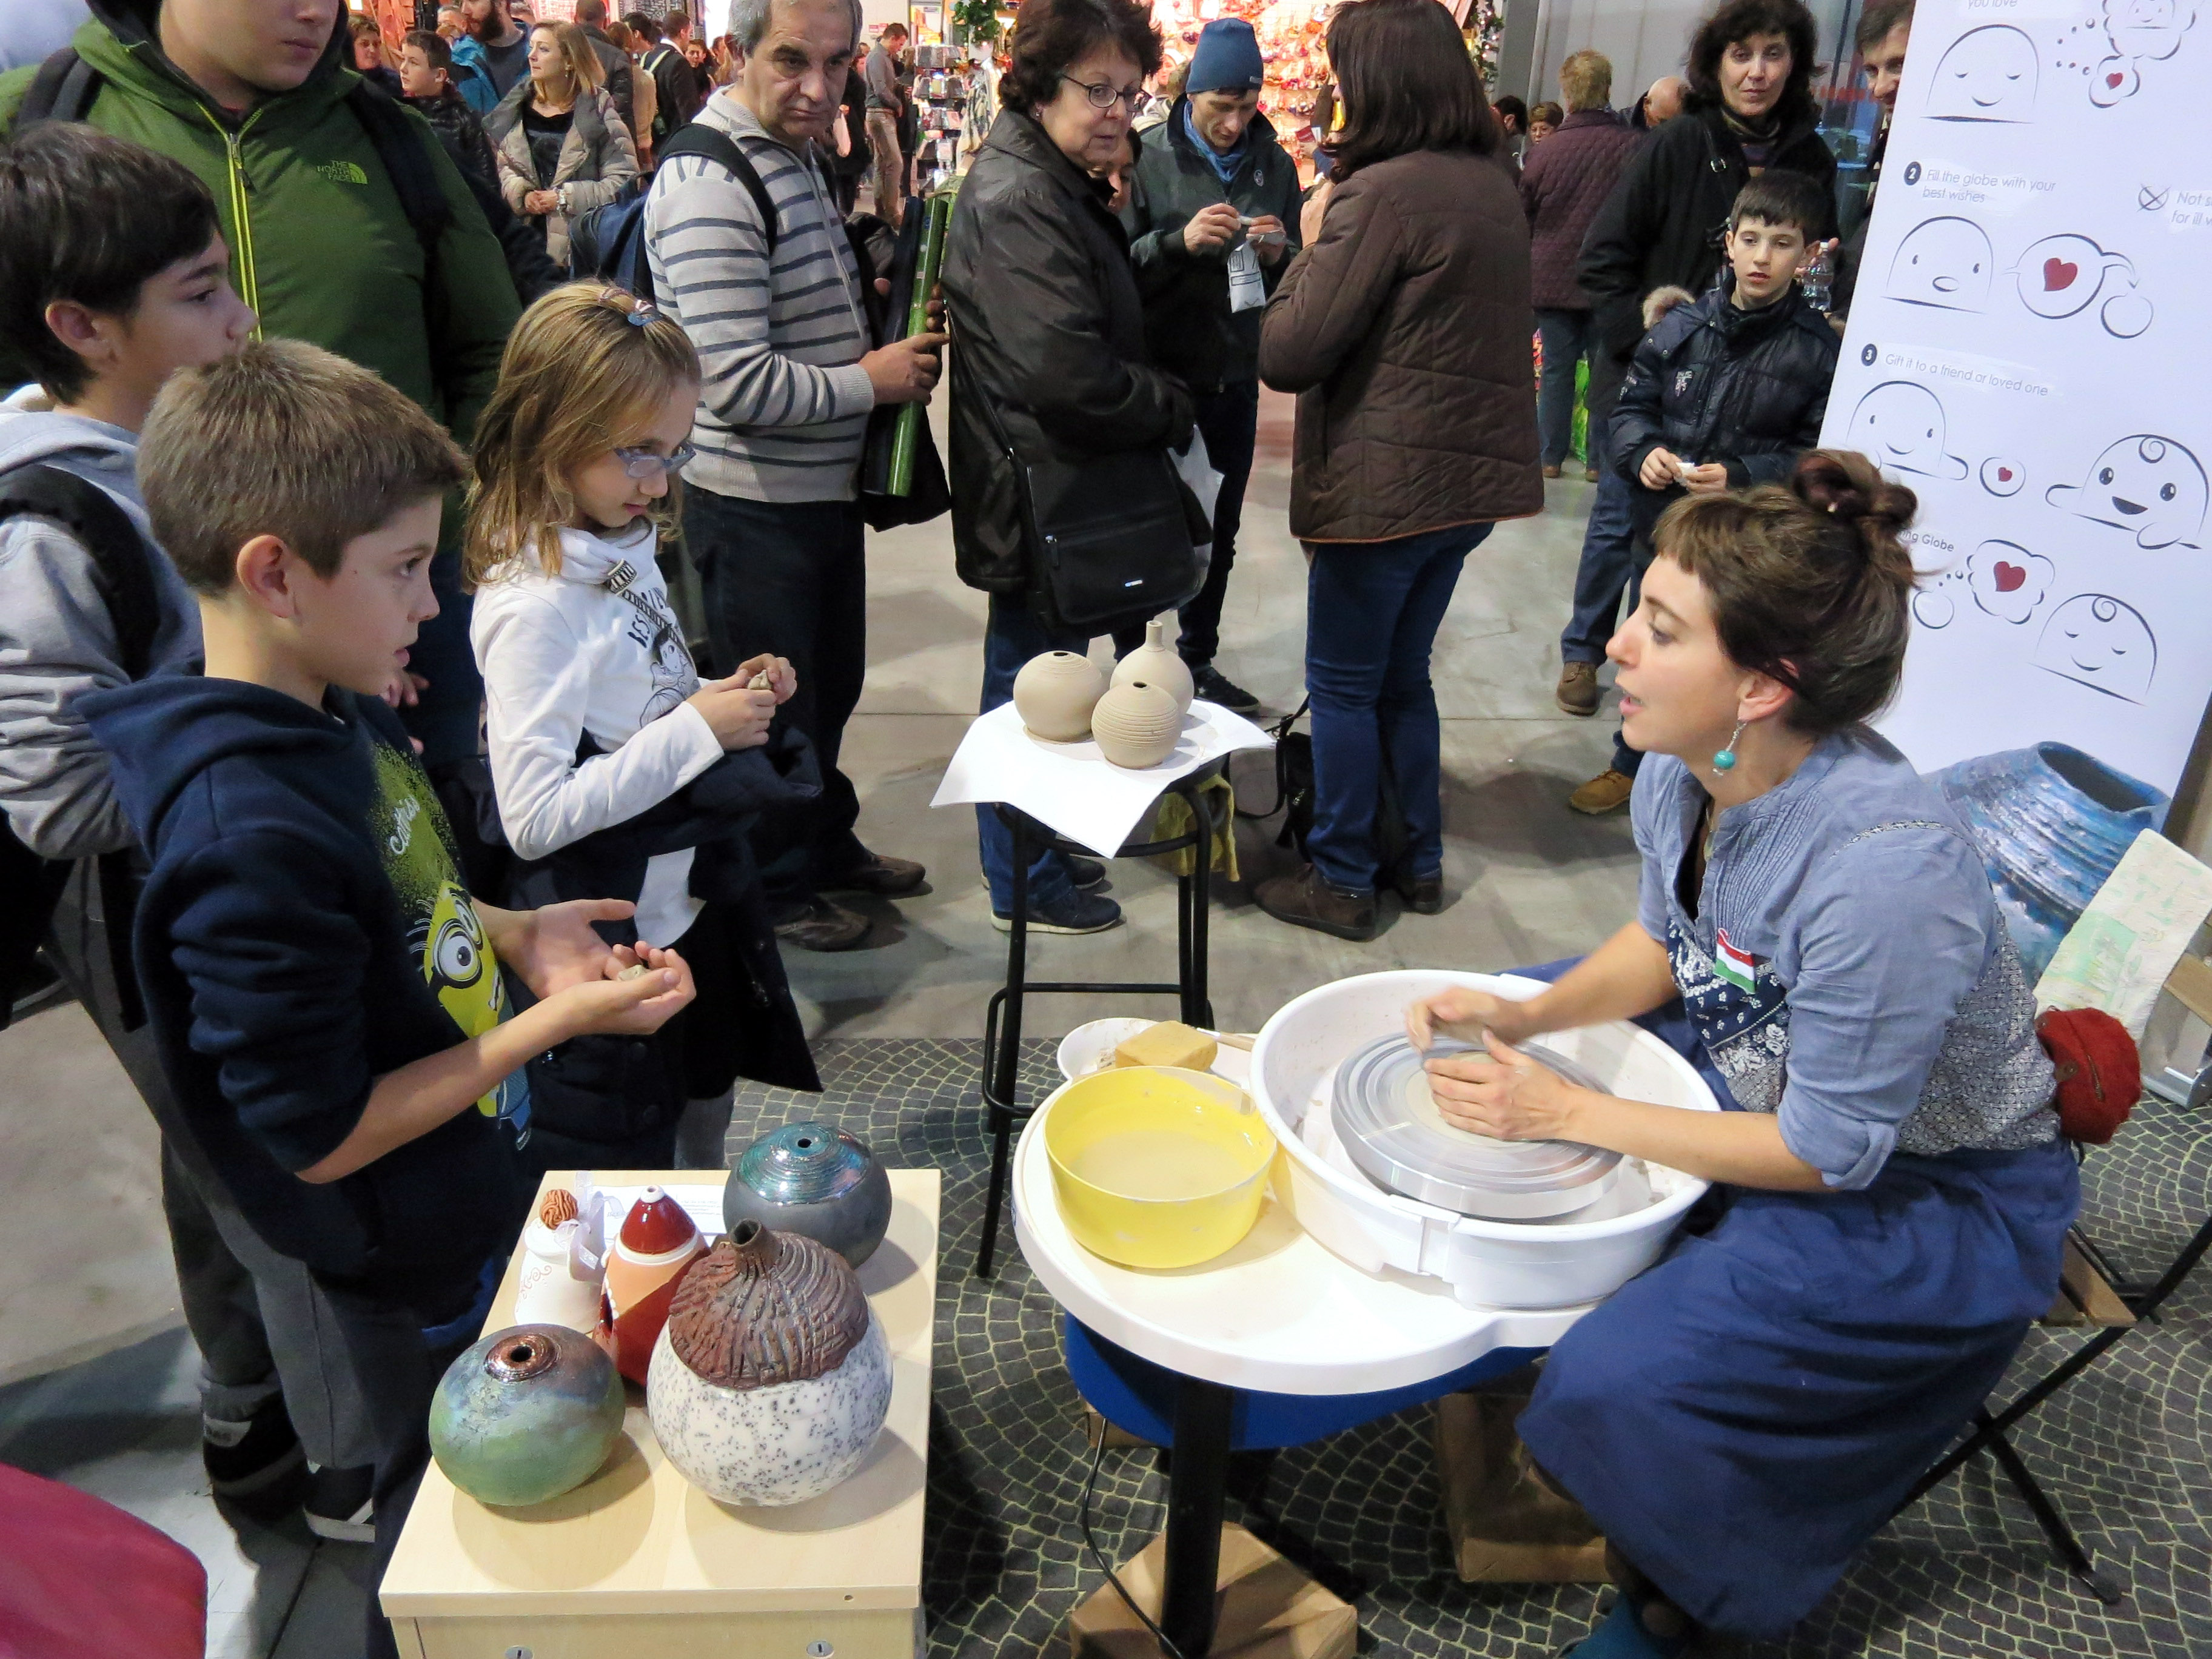 Children Loved It - L'Artigiano in Fiera: Exhibition and Fair in Milan